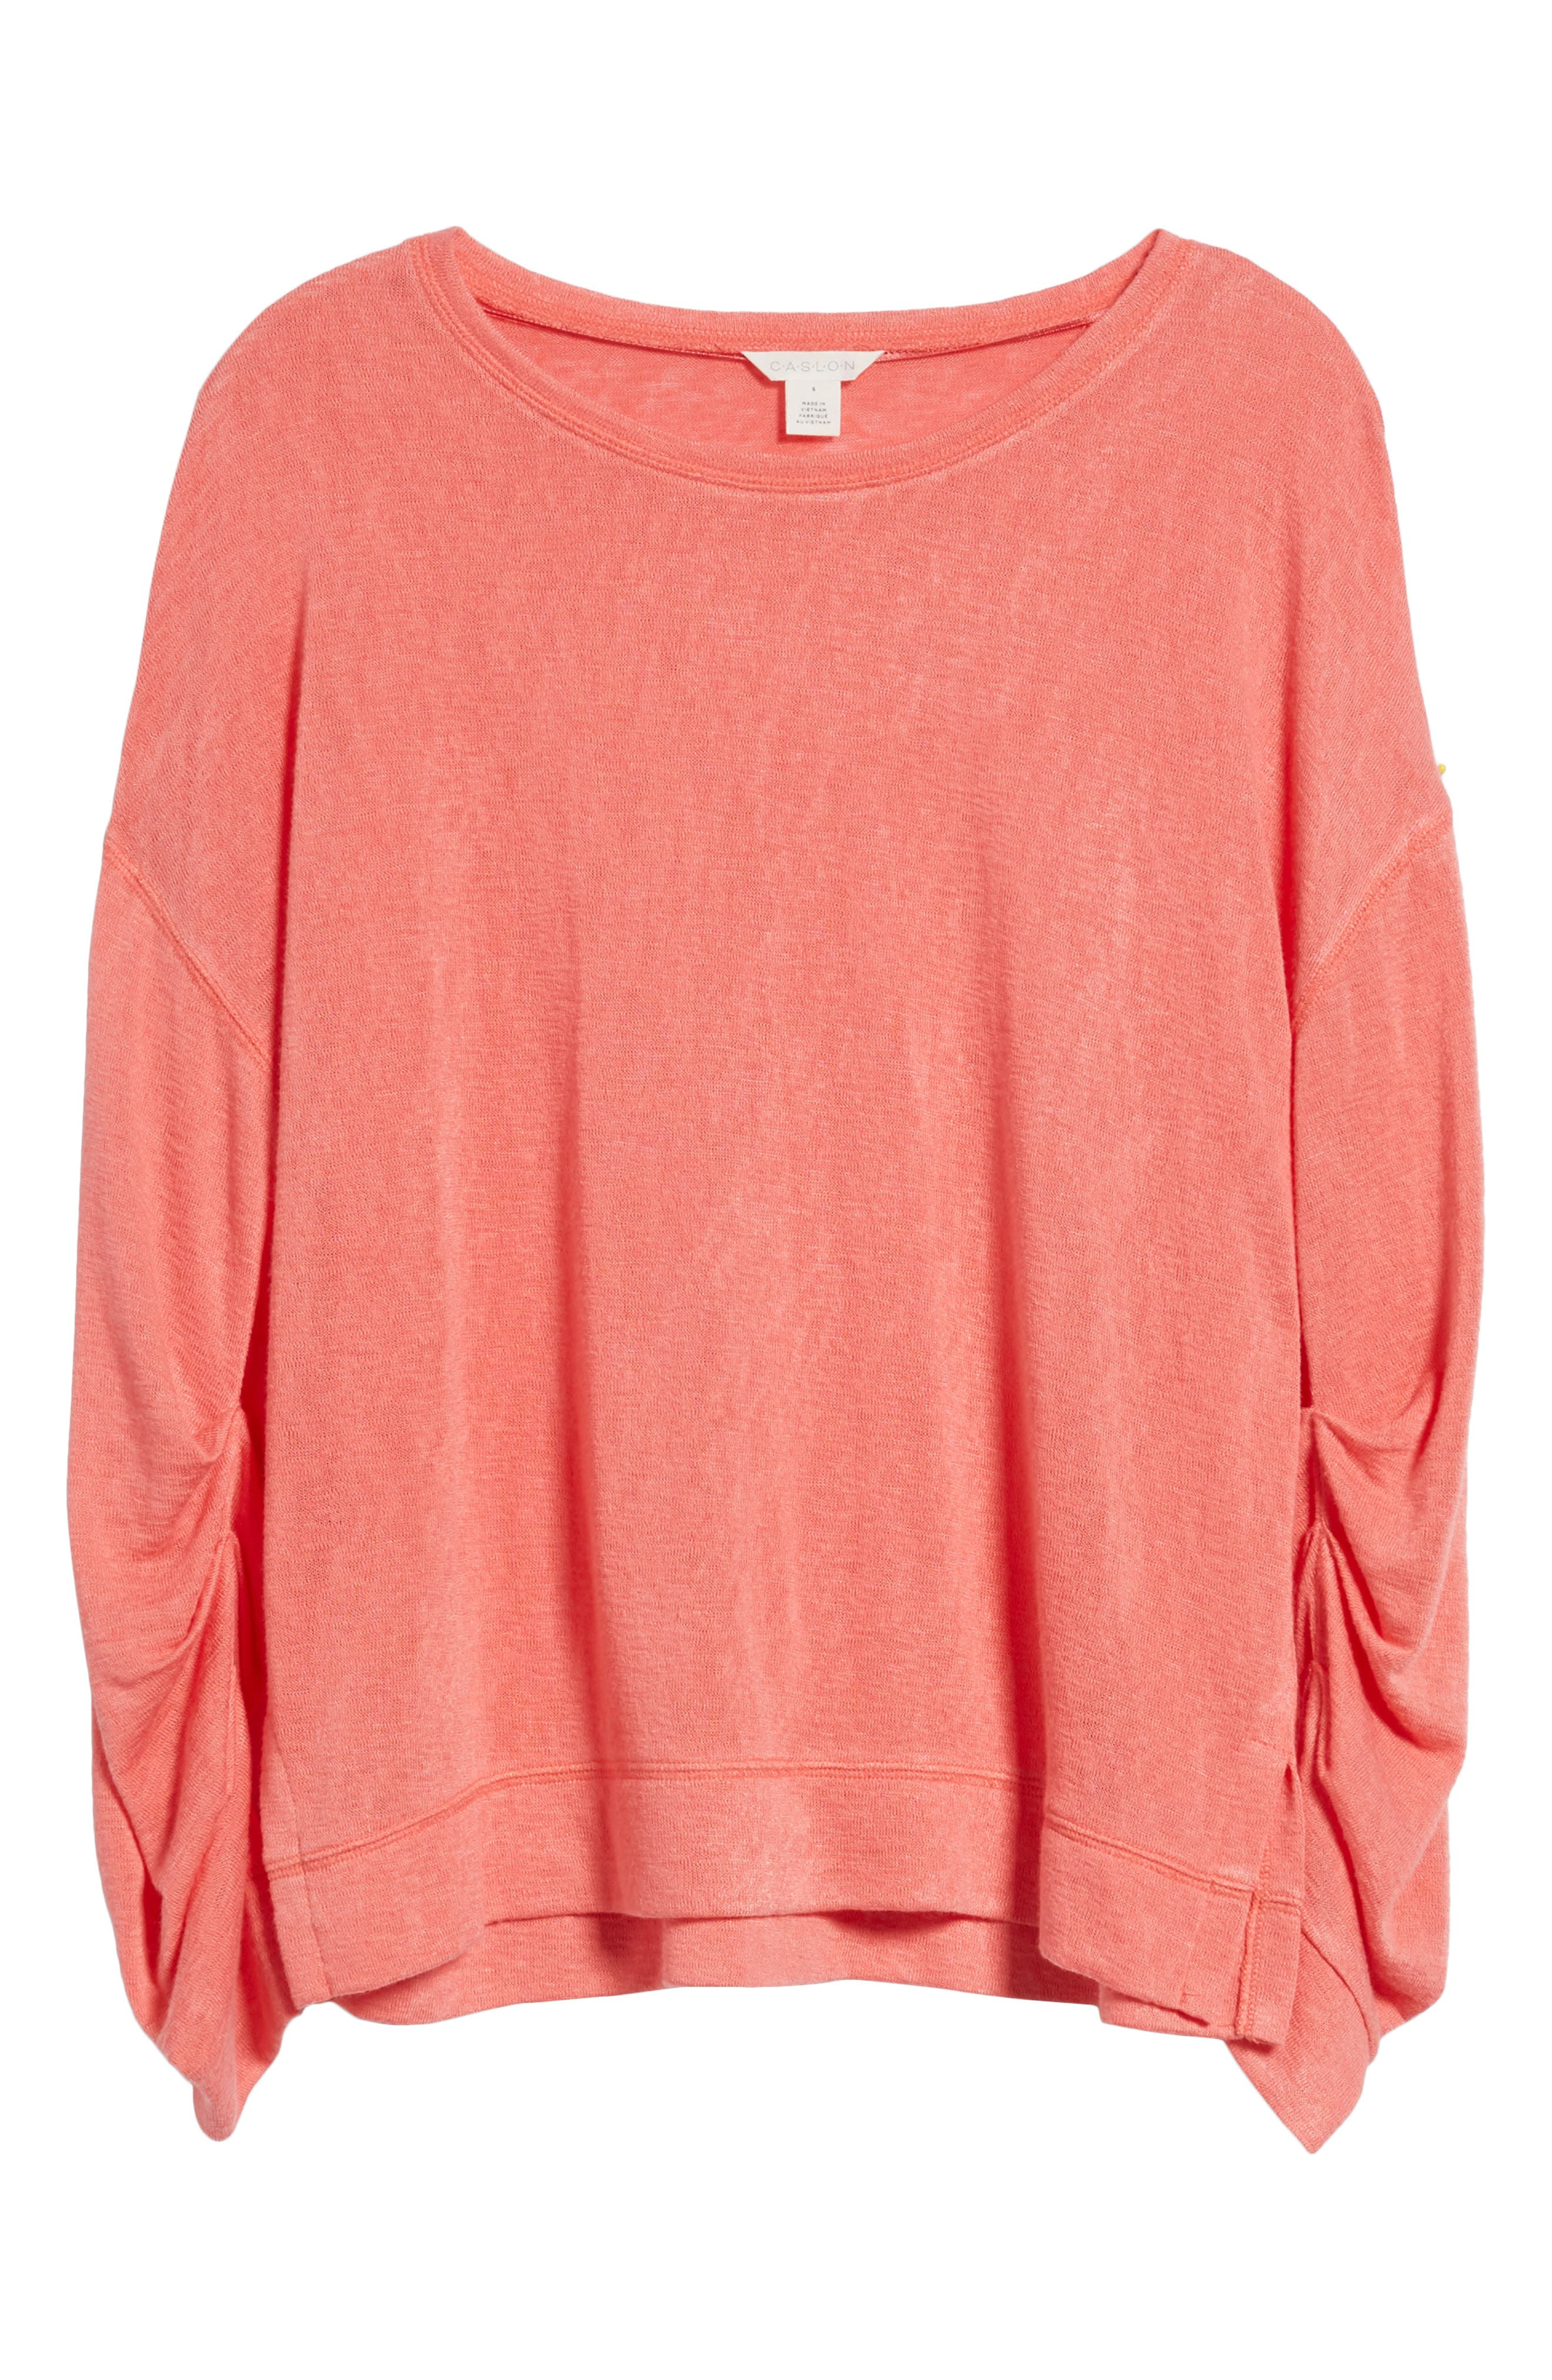 Tuck Sleeve Sweatshirt,                             Alternate thumbnail 7, color,                             Coral Rose